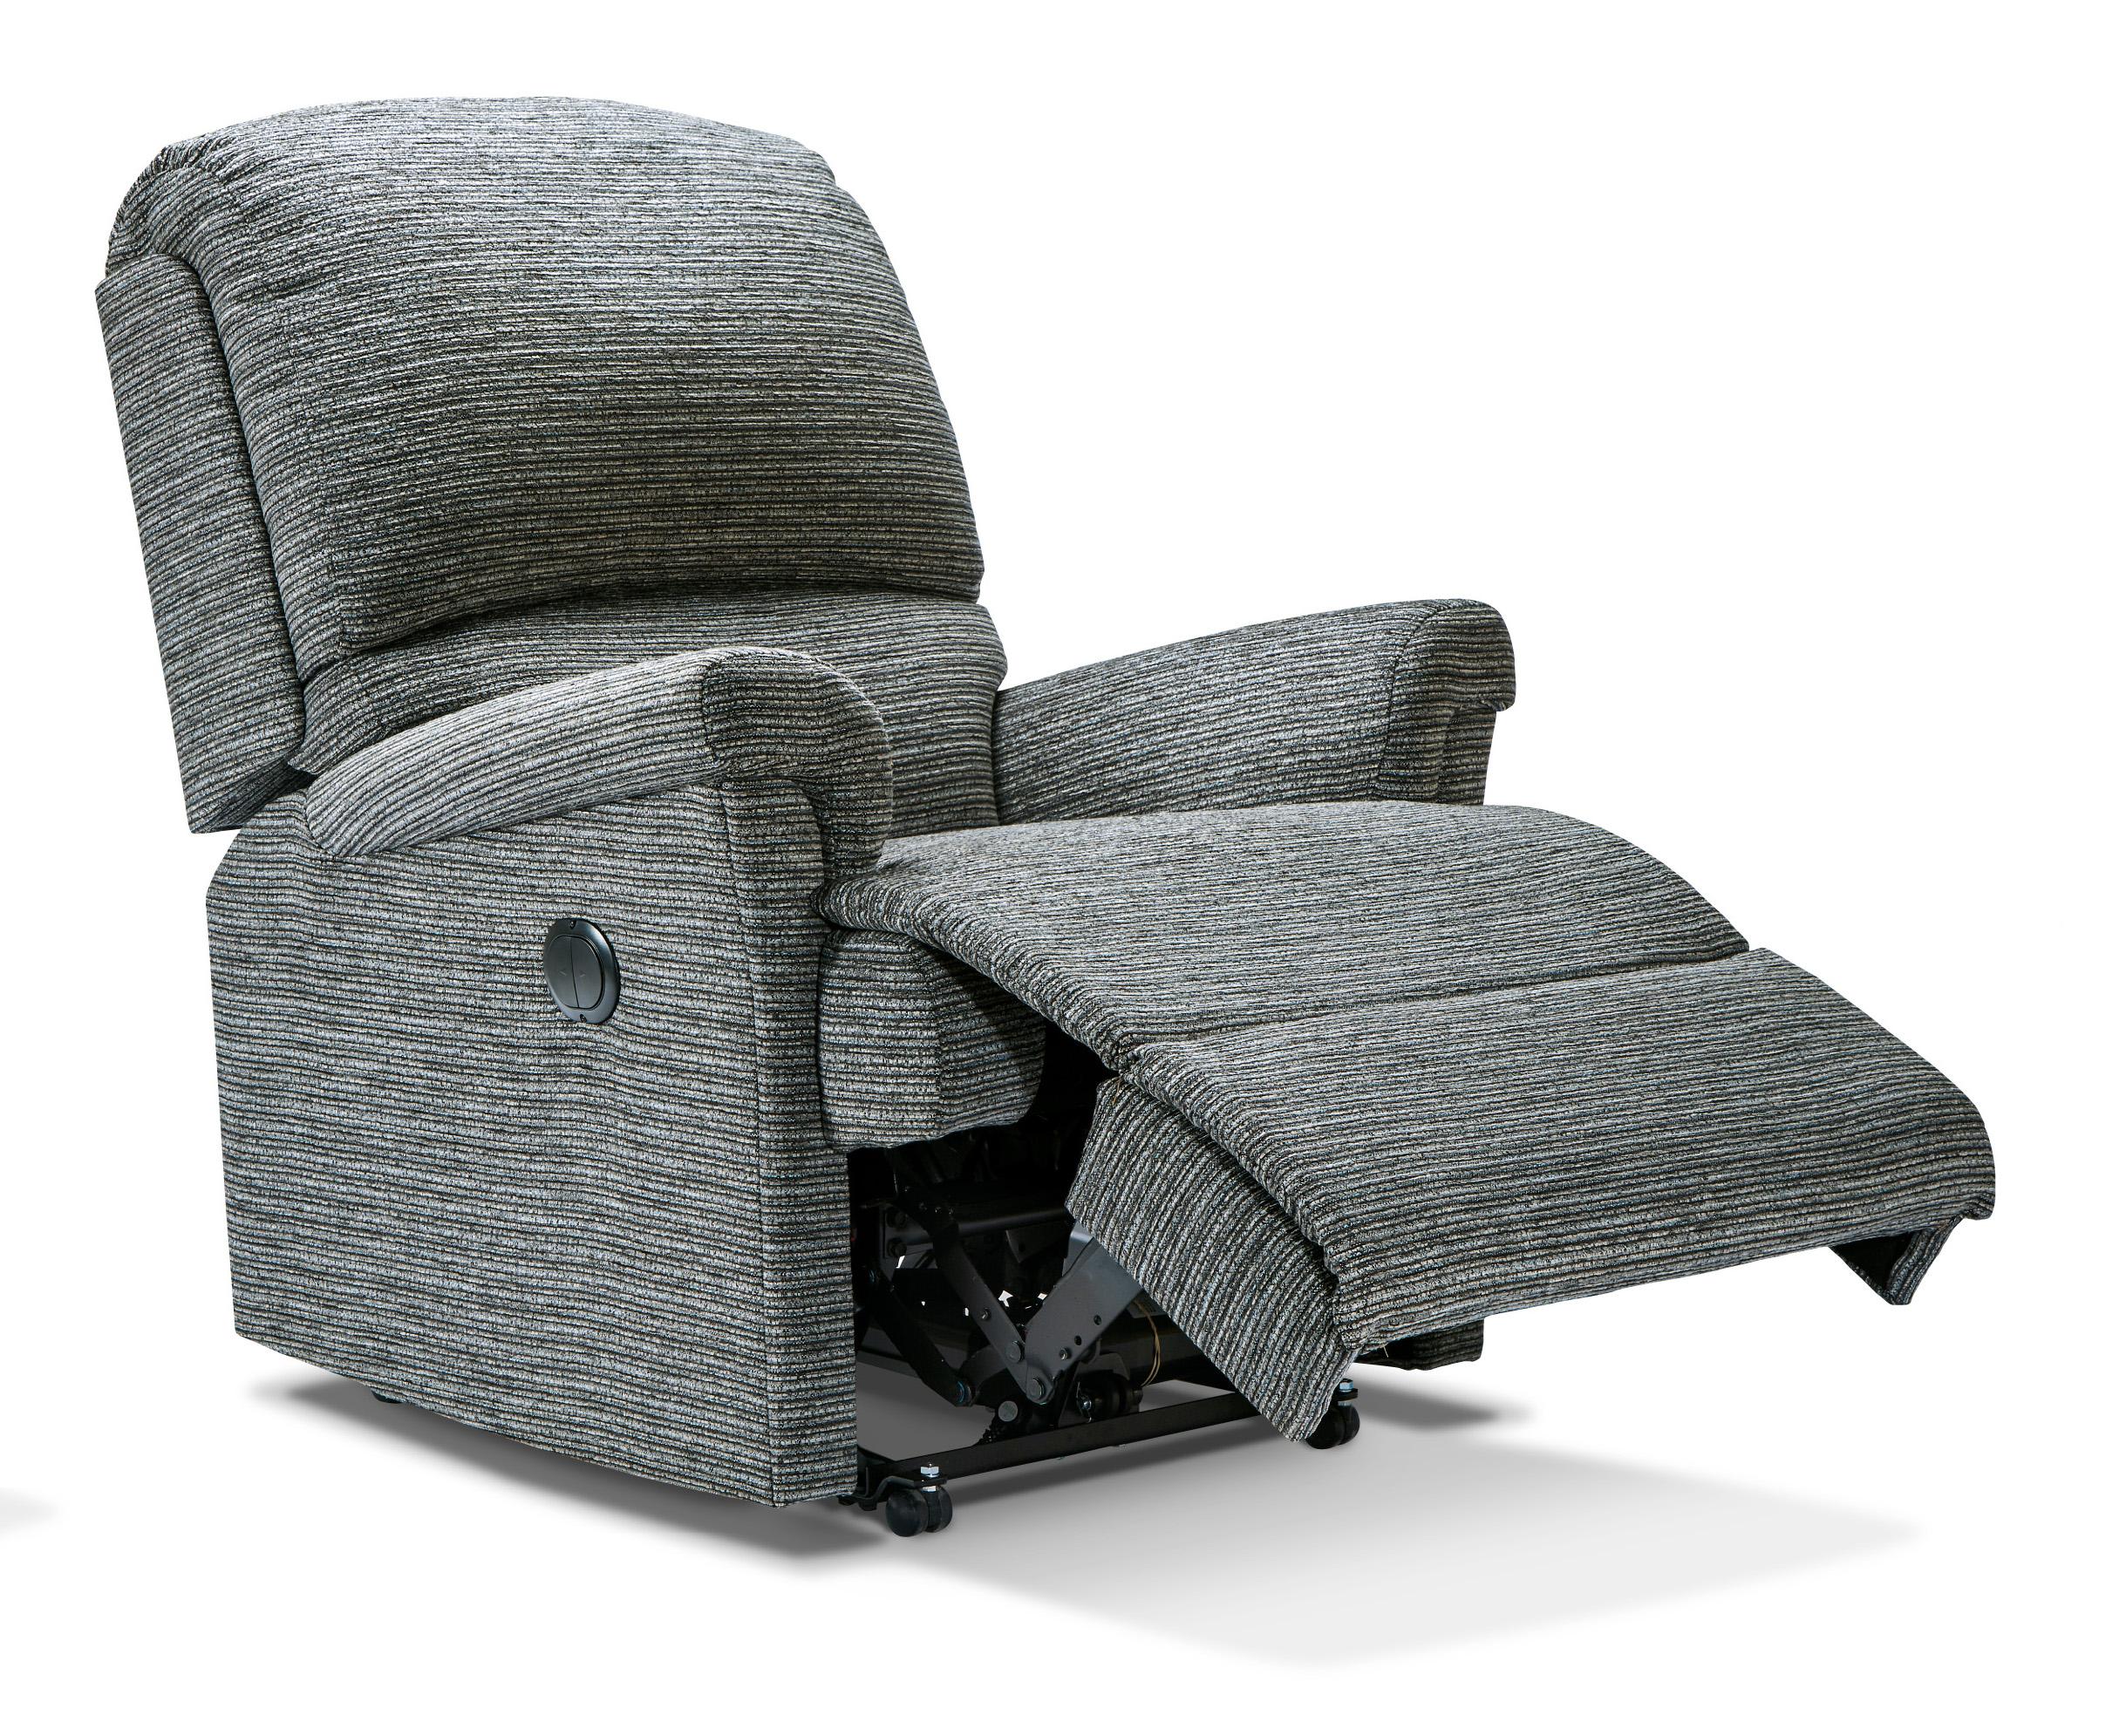 Nevada Reclining Chair